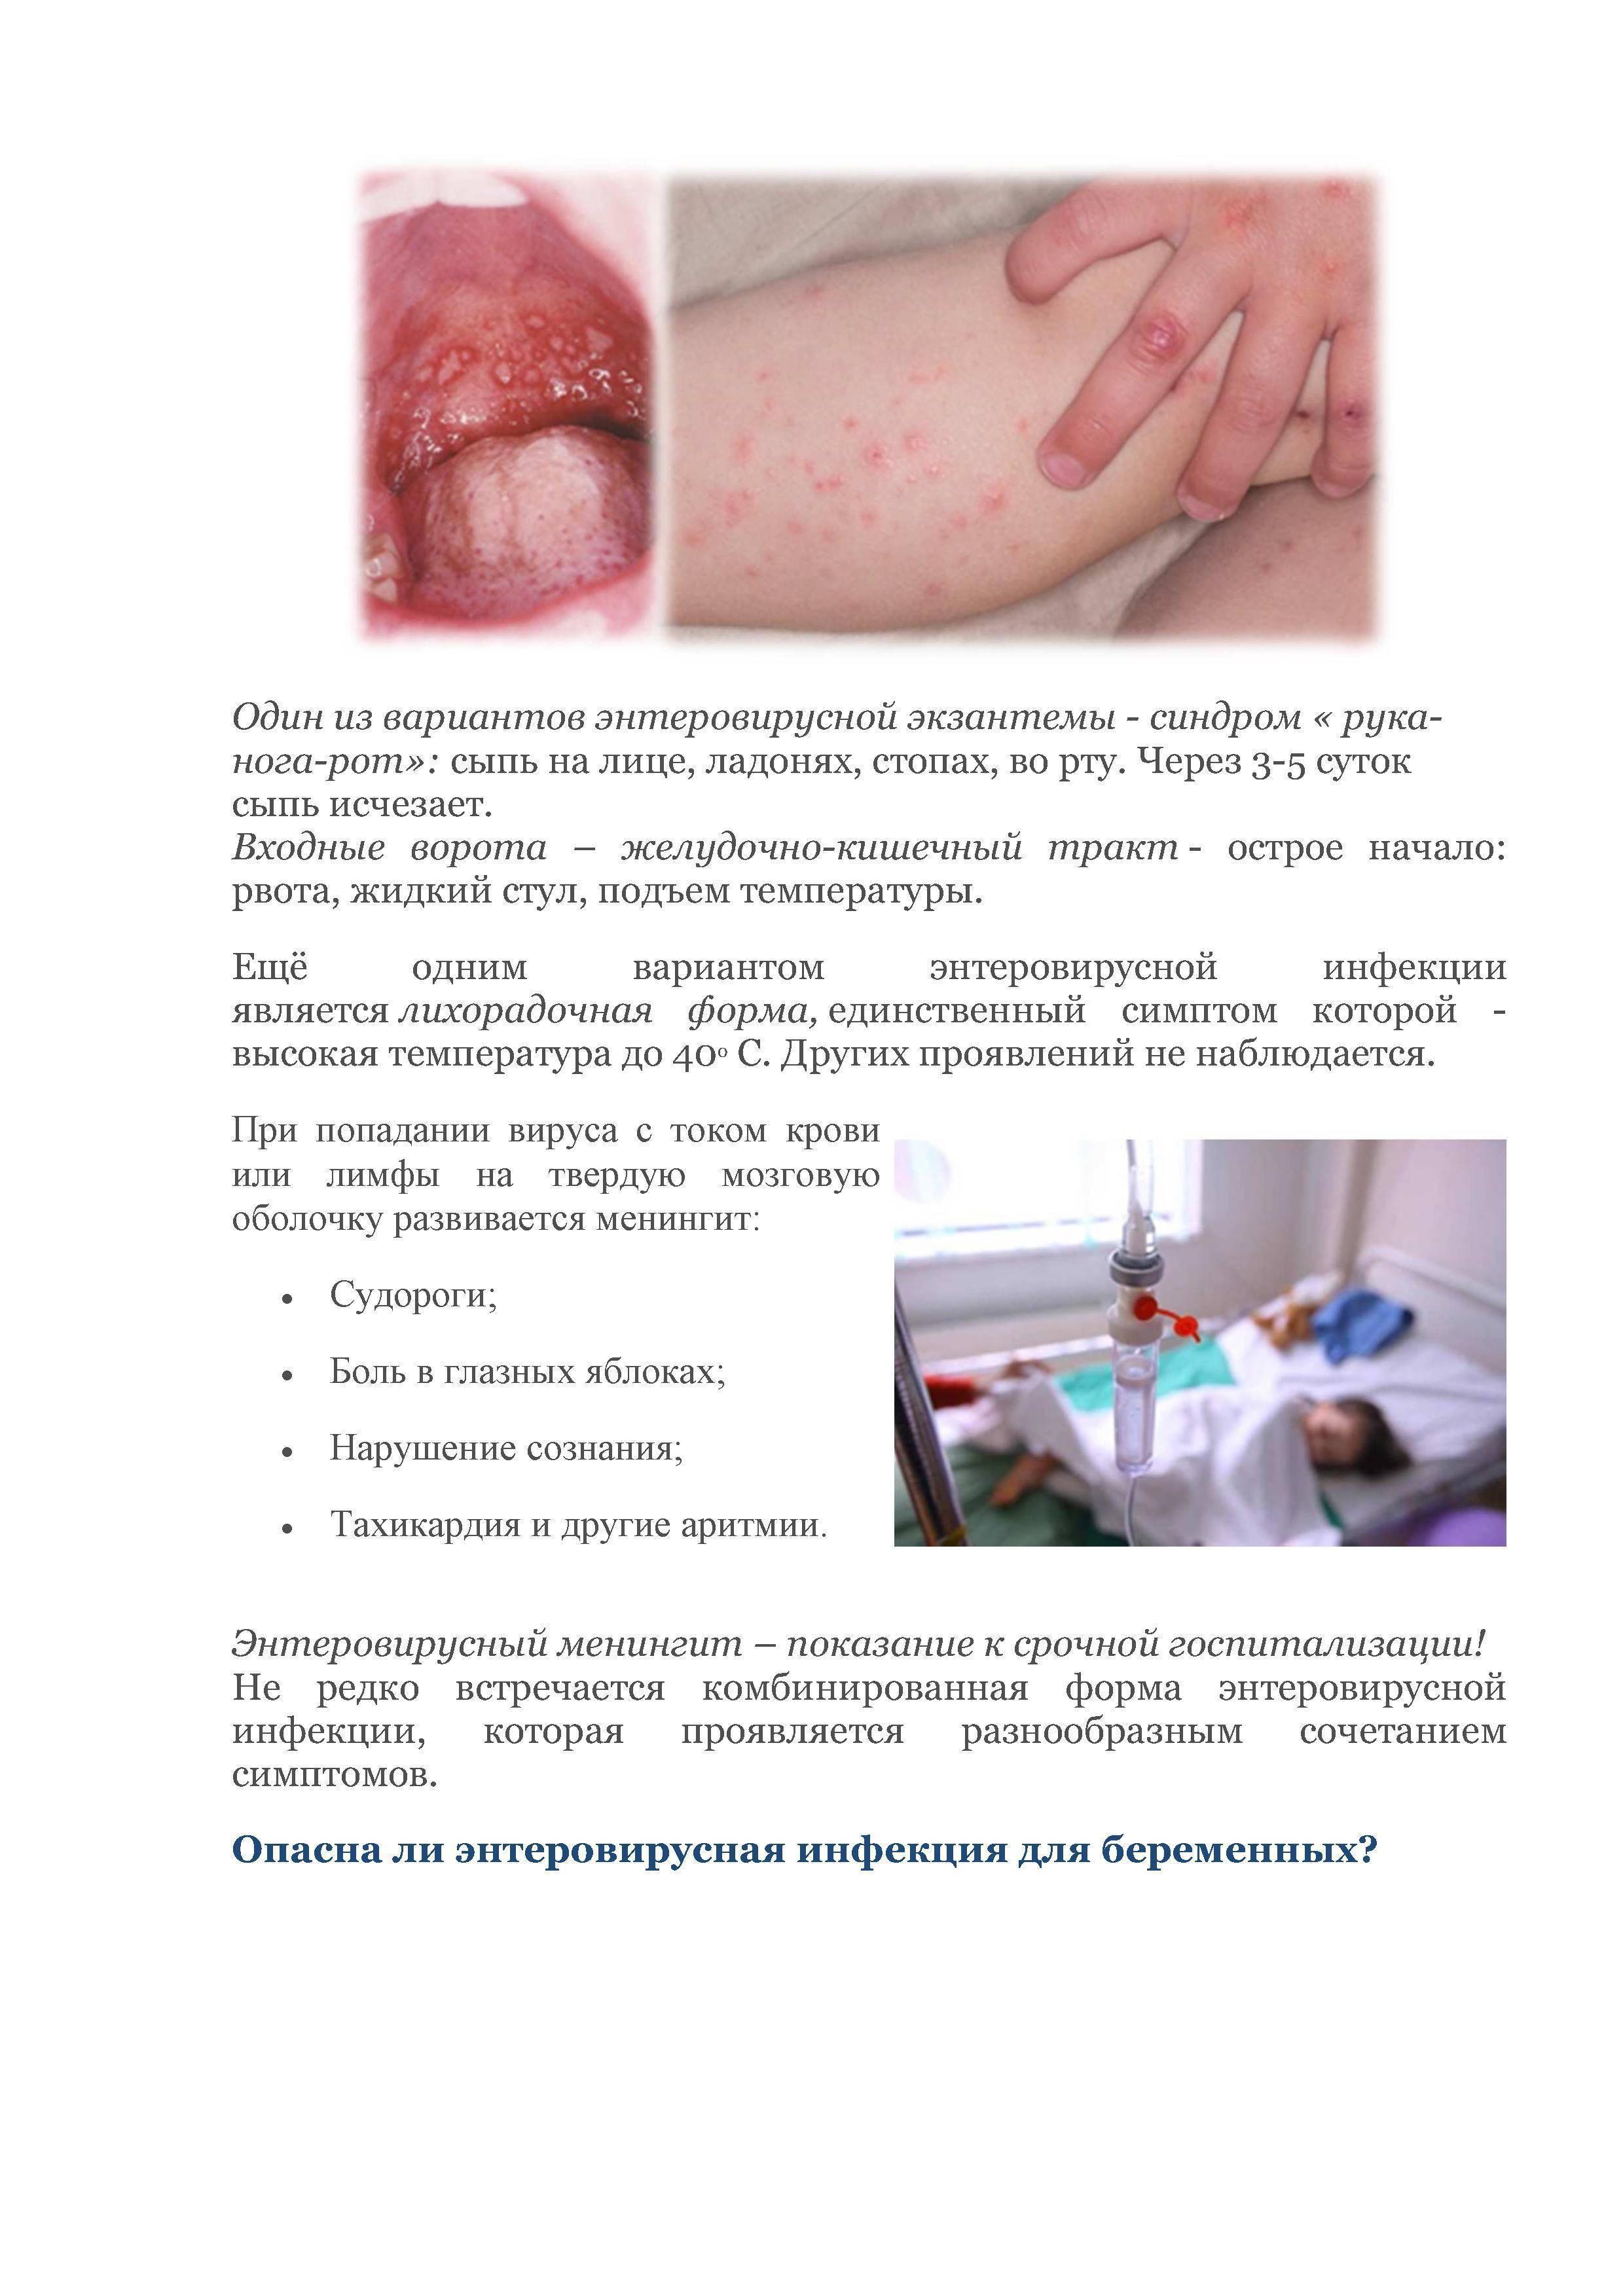 Синдром рука нога рот у взрослых лечение